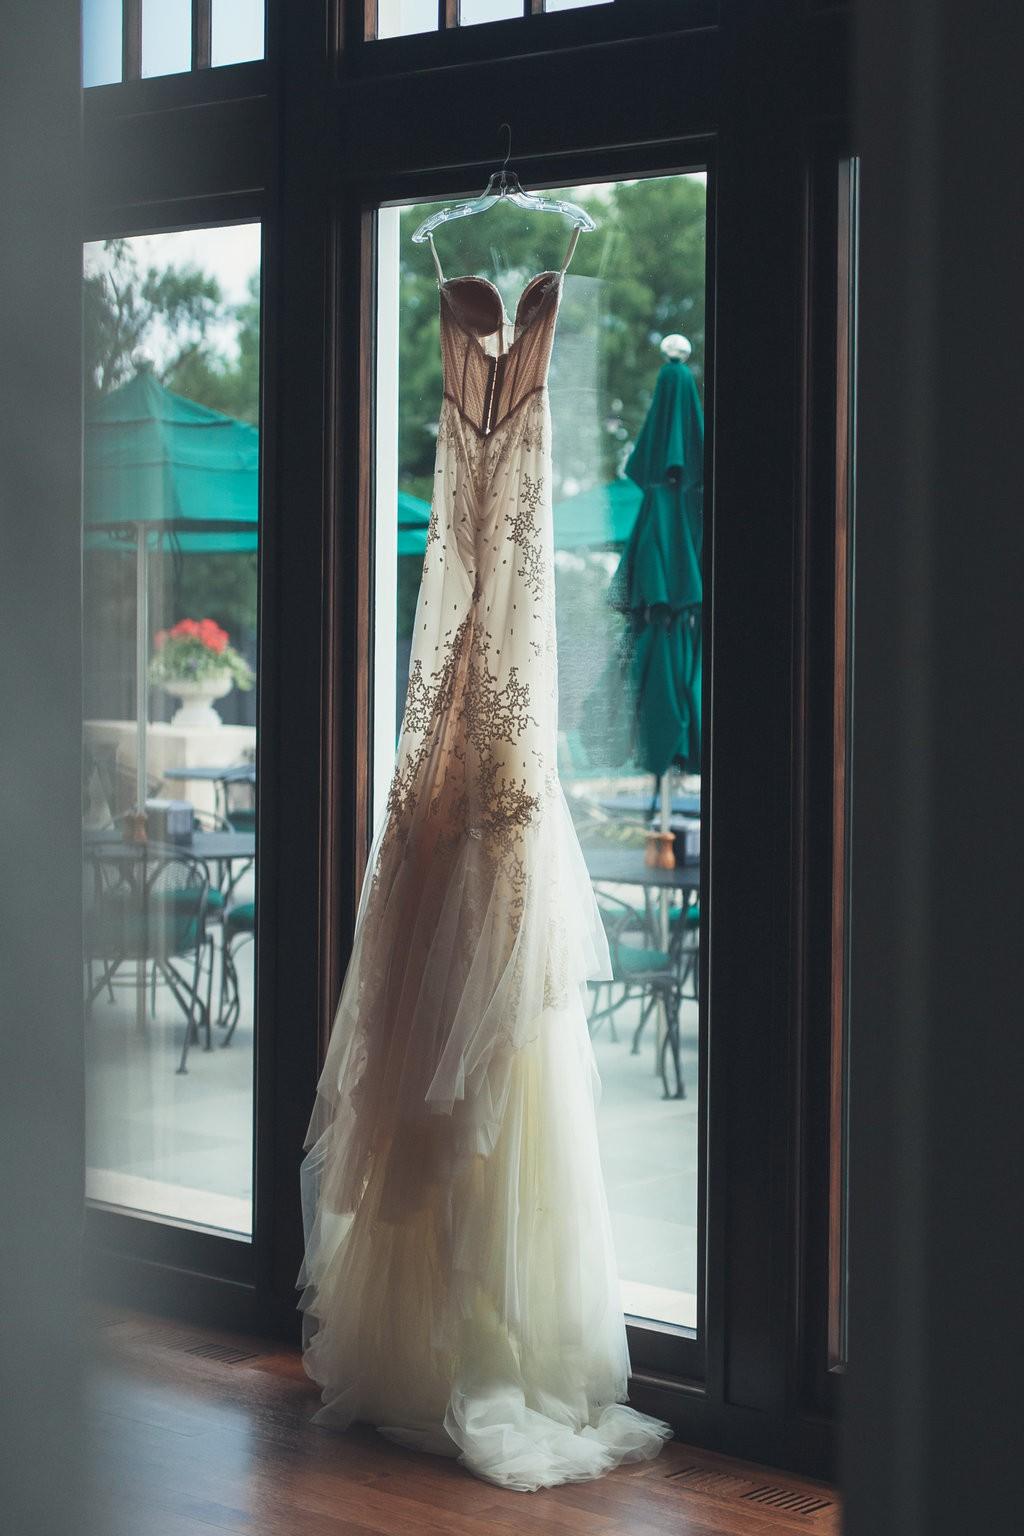 inbal dror used wedding dress » Wedding Dresses Designs, Ideas and ...